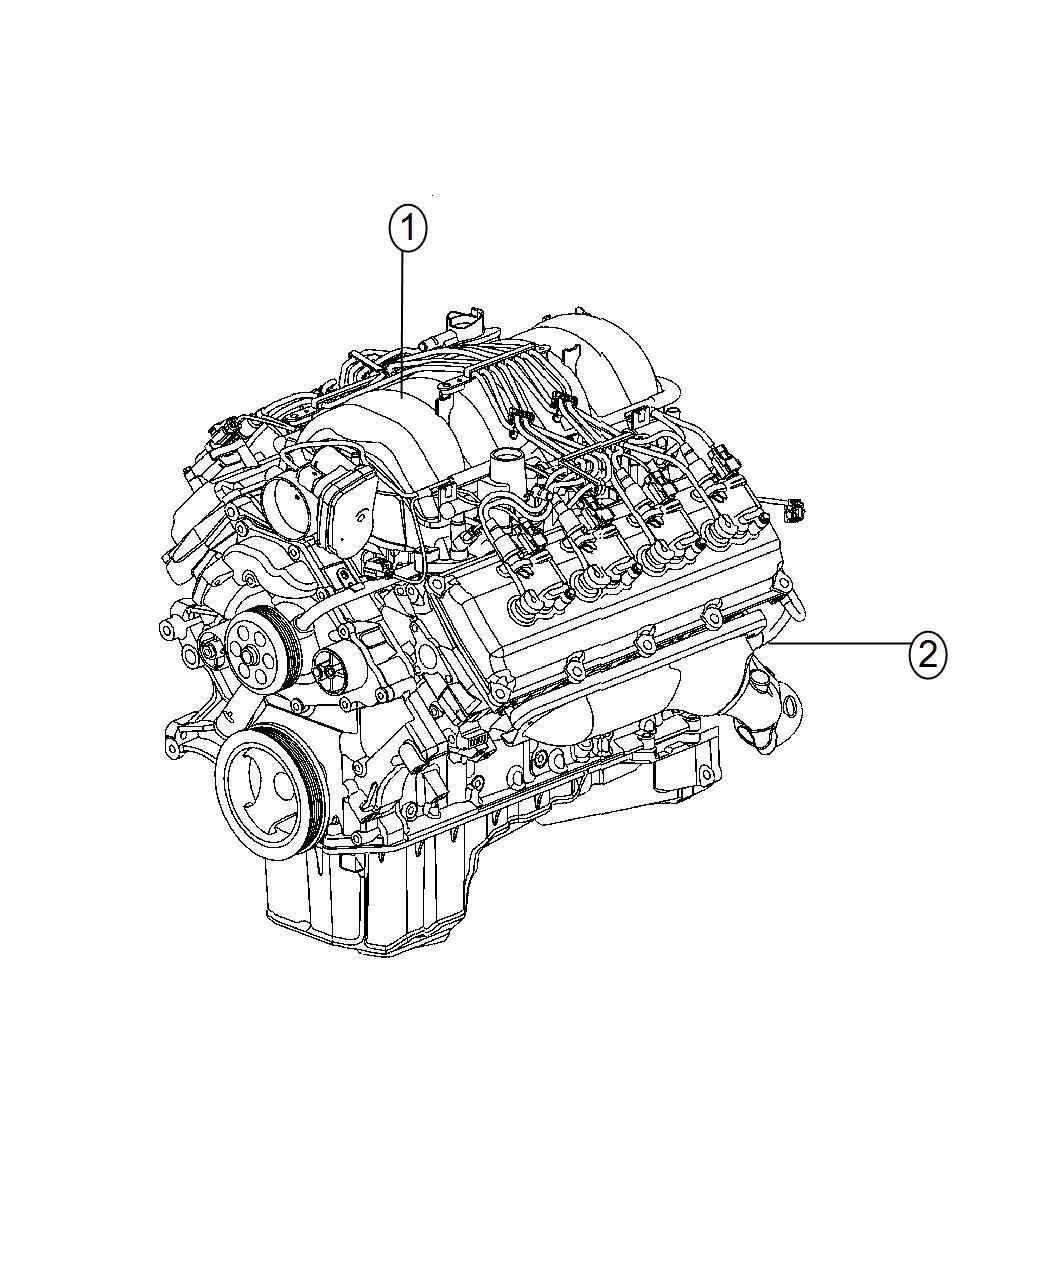 Dodge Ram Engine Long Block Remanufactured Failure